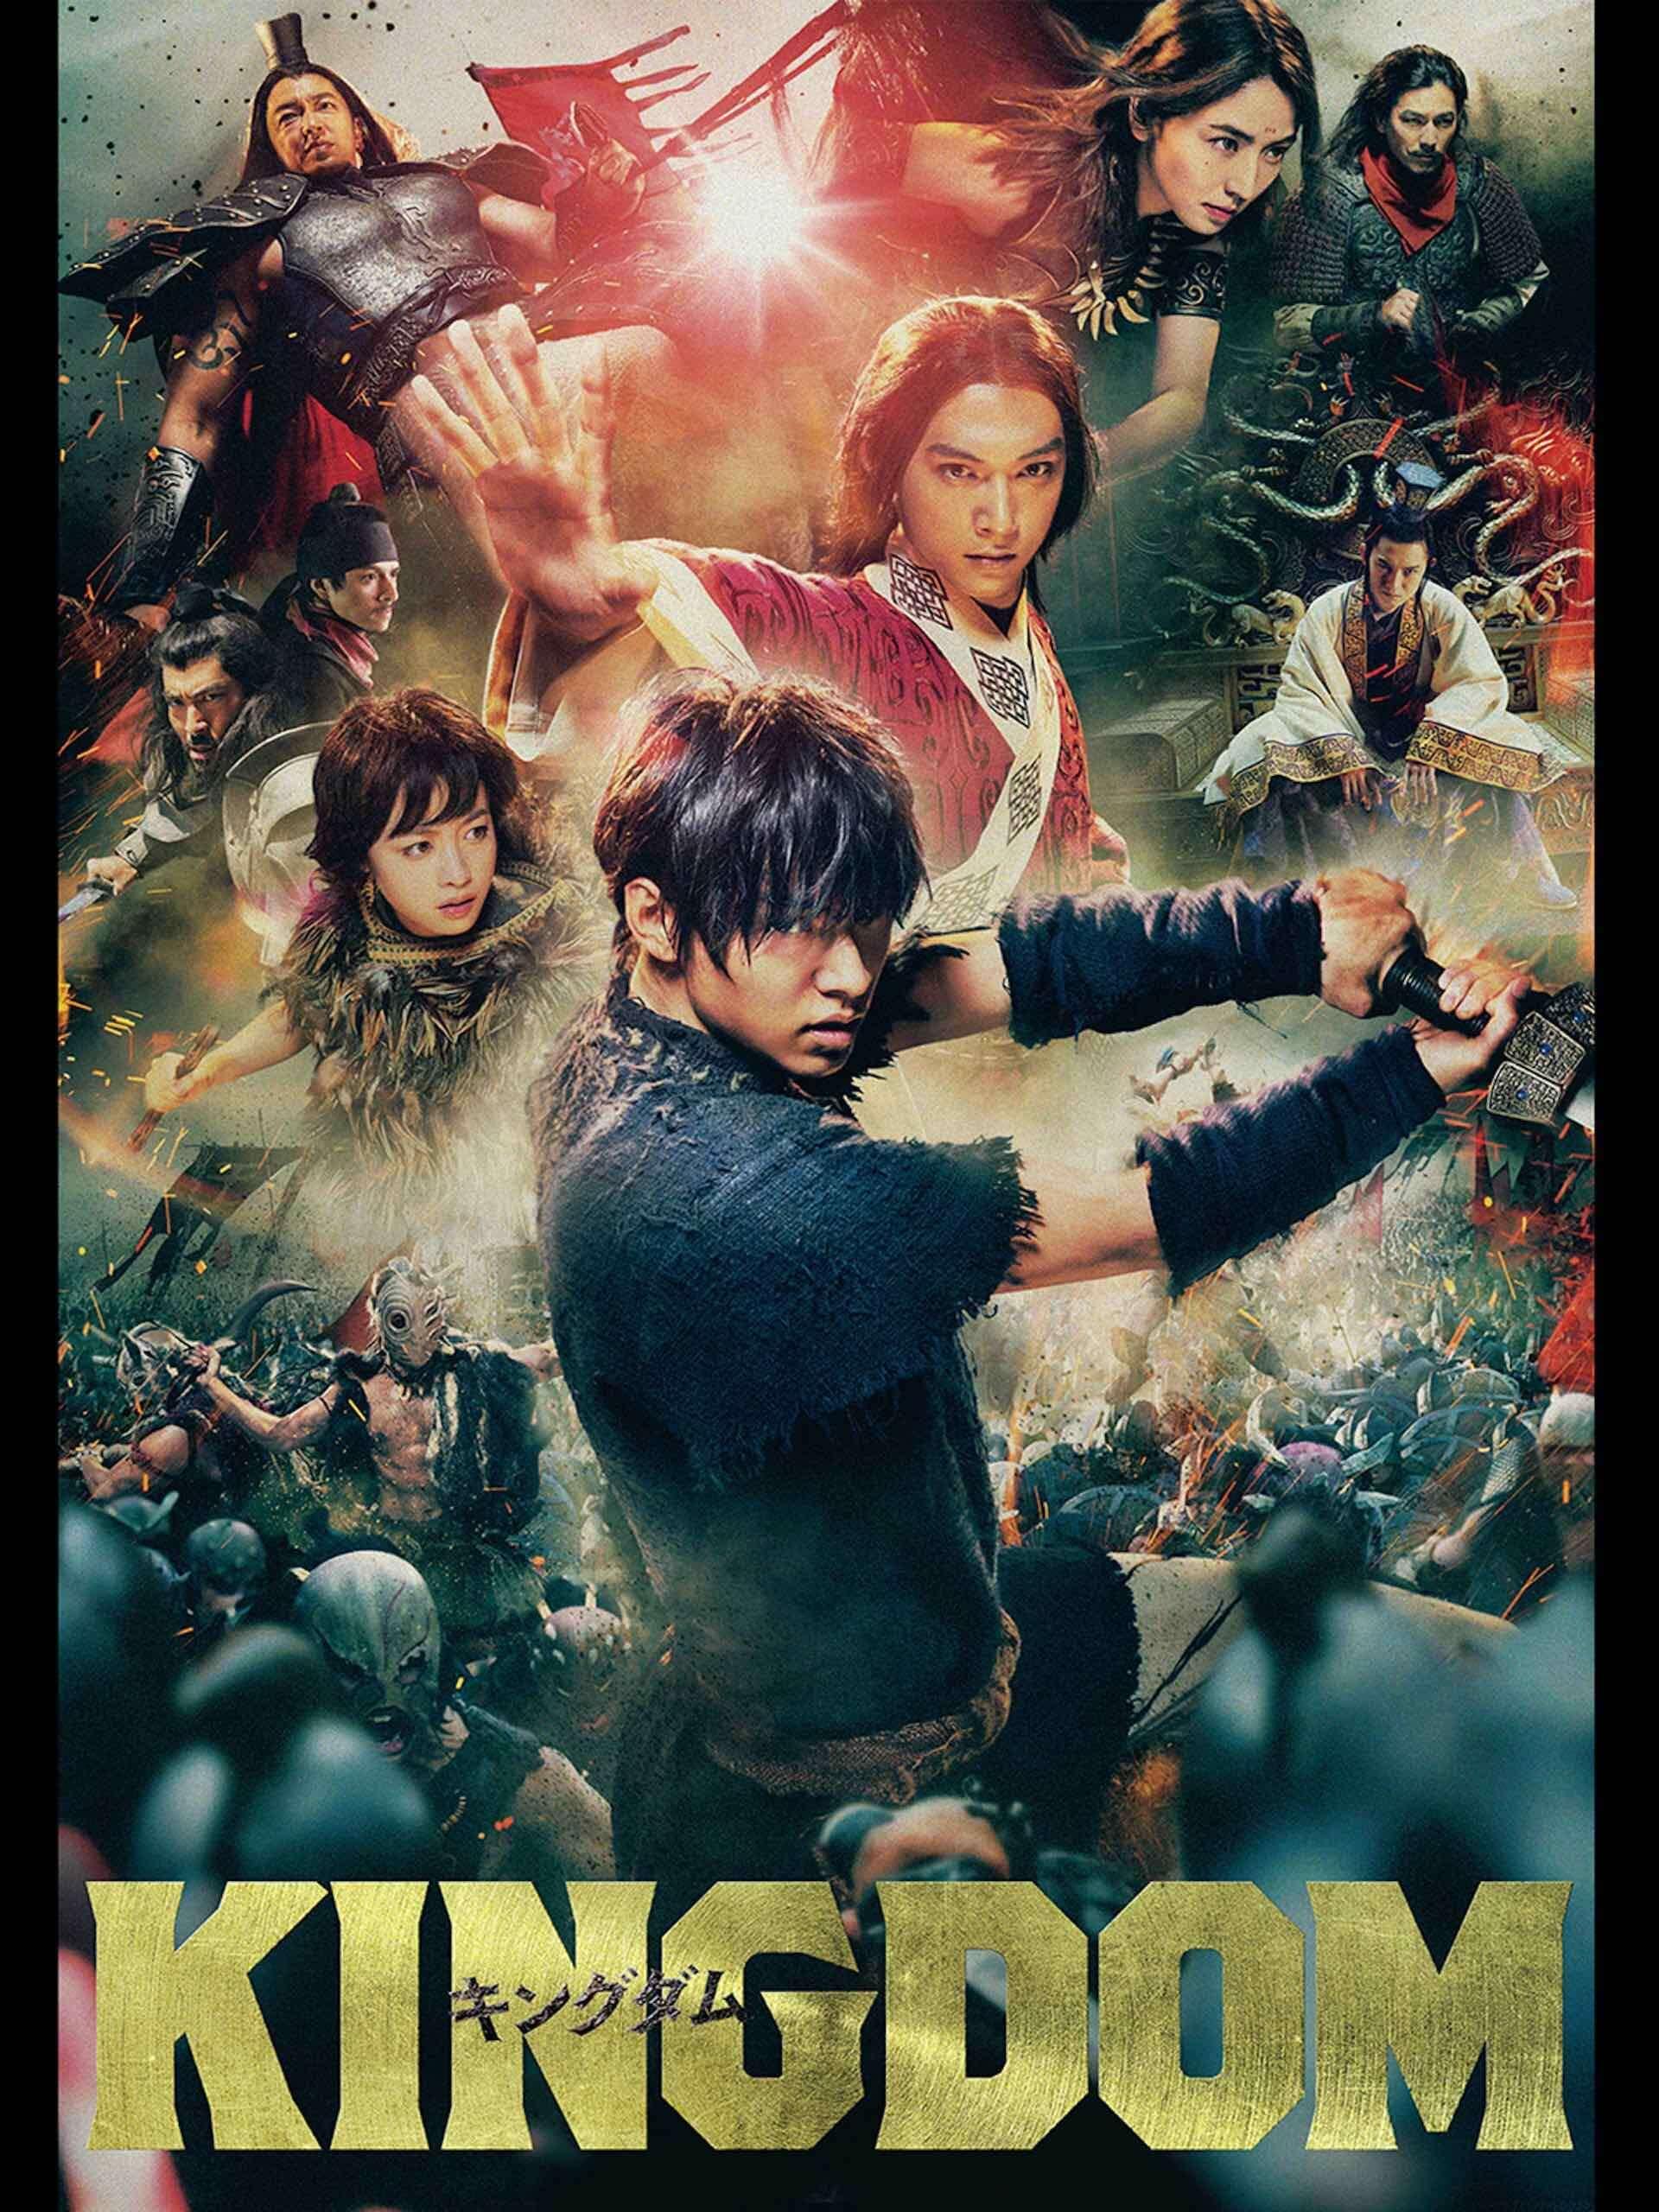 Amazon Prime Videoに『キングダム』、松本人志『FREEZE』新作など続々登場!DREAMS COME TRUE映像作品など7月の新着コンテンツが解禁 film200630_amazonprime_4-1920x2560